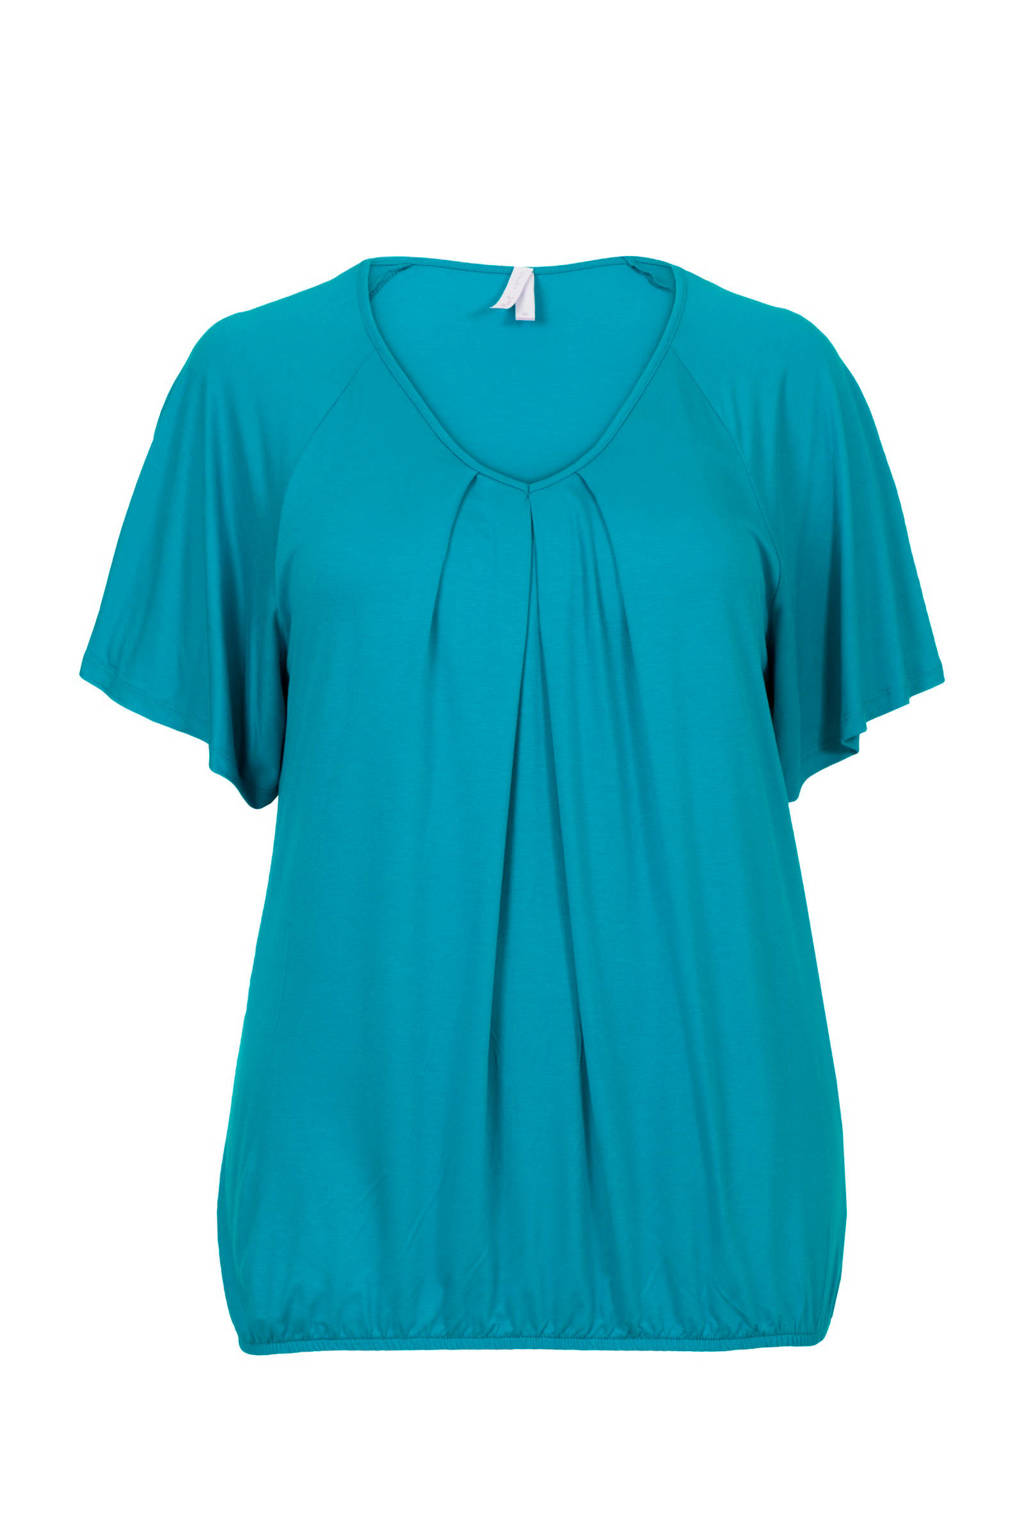 Miss Etam Plus T-shirt turquoise, Turquoise